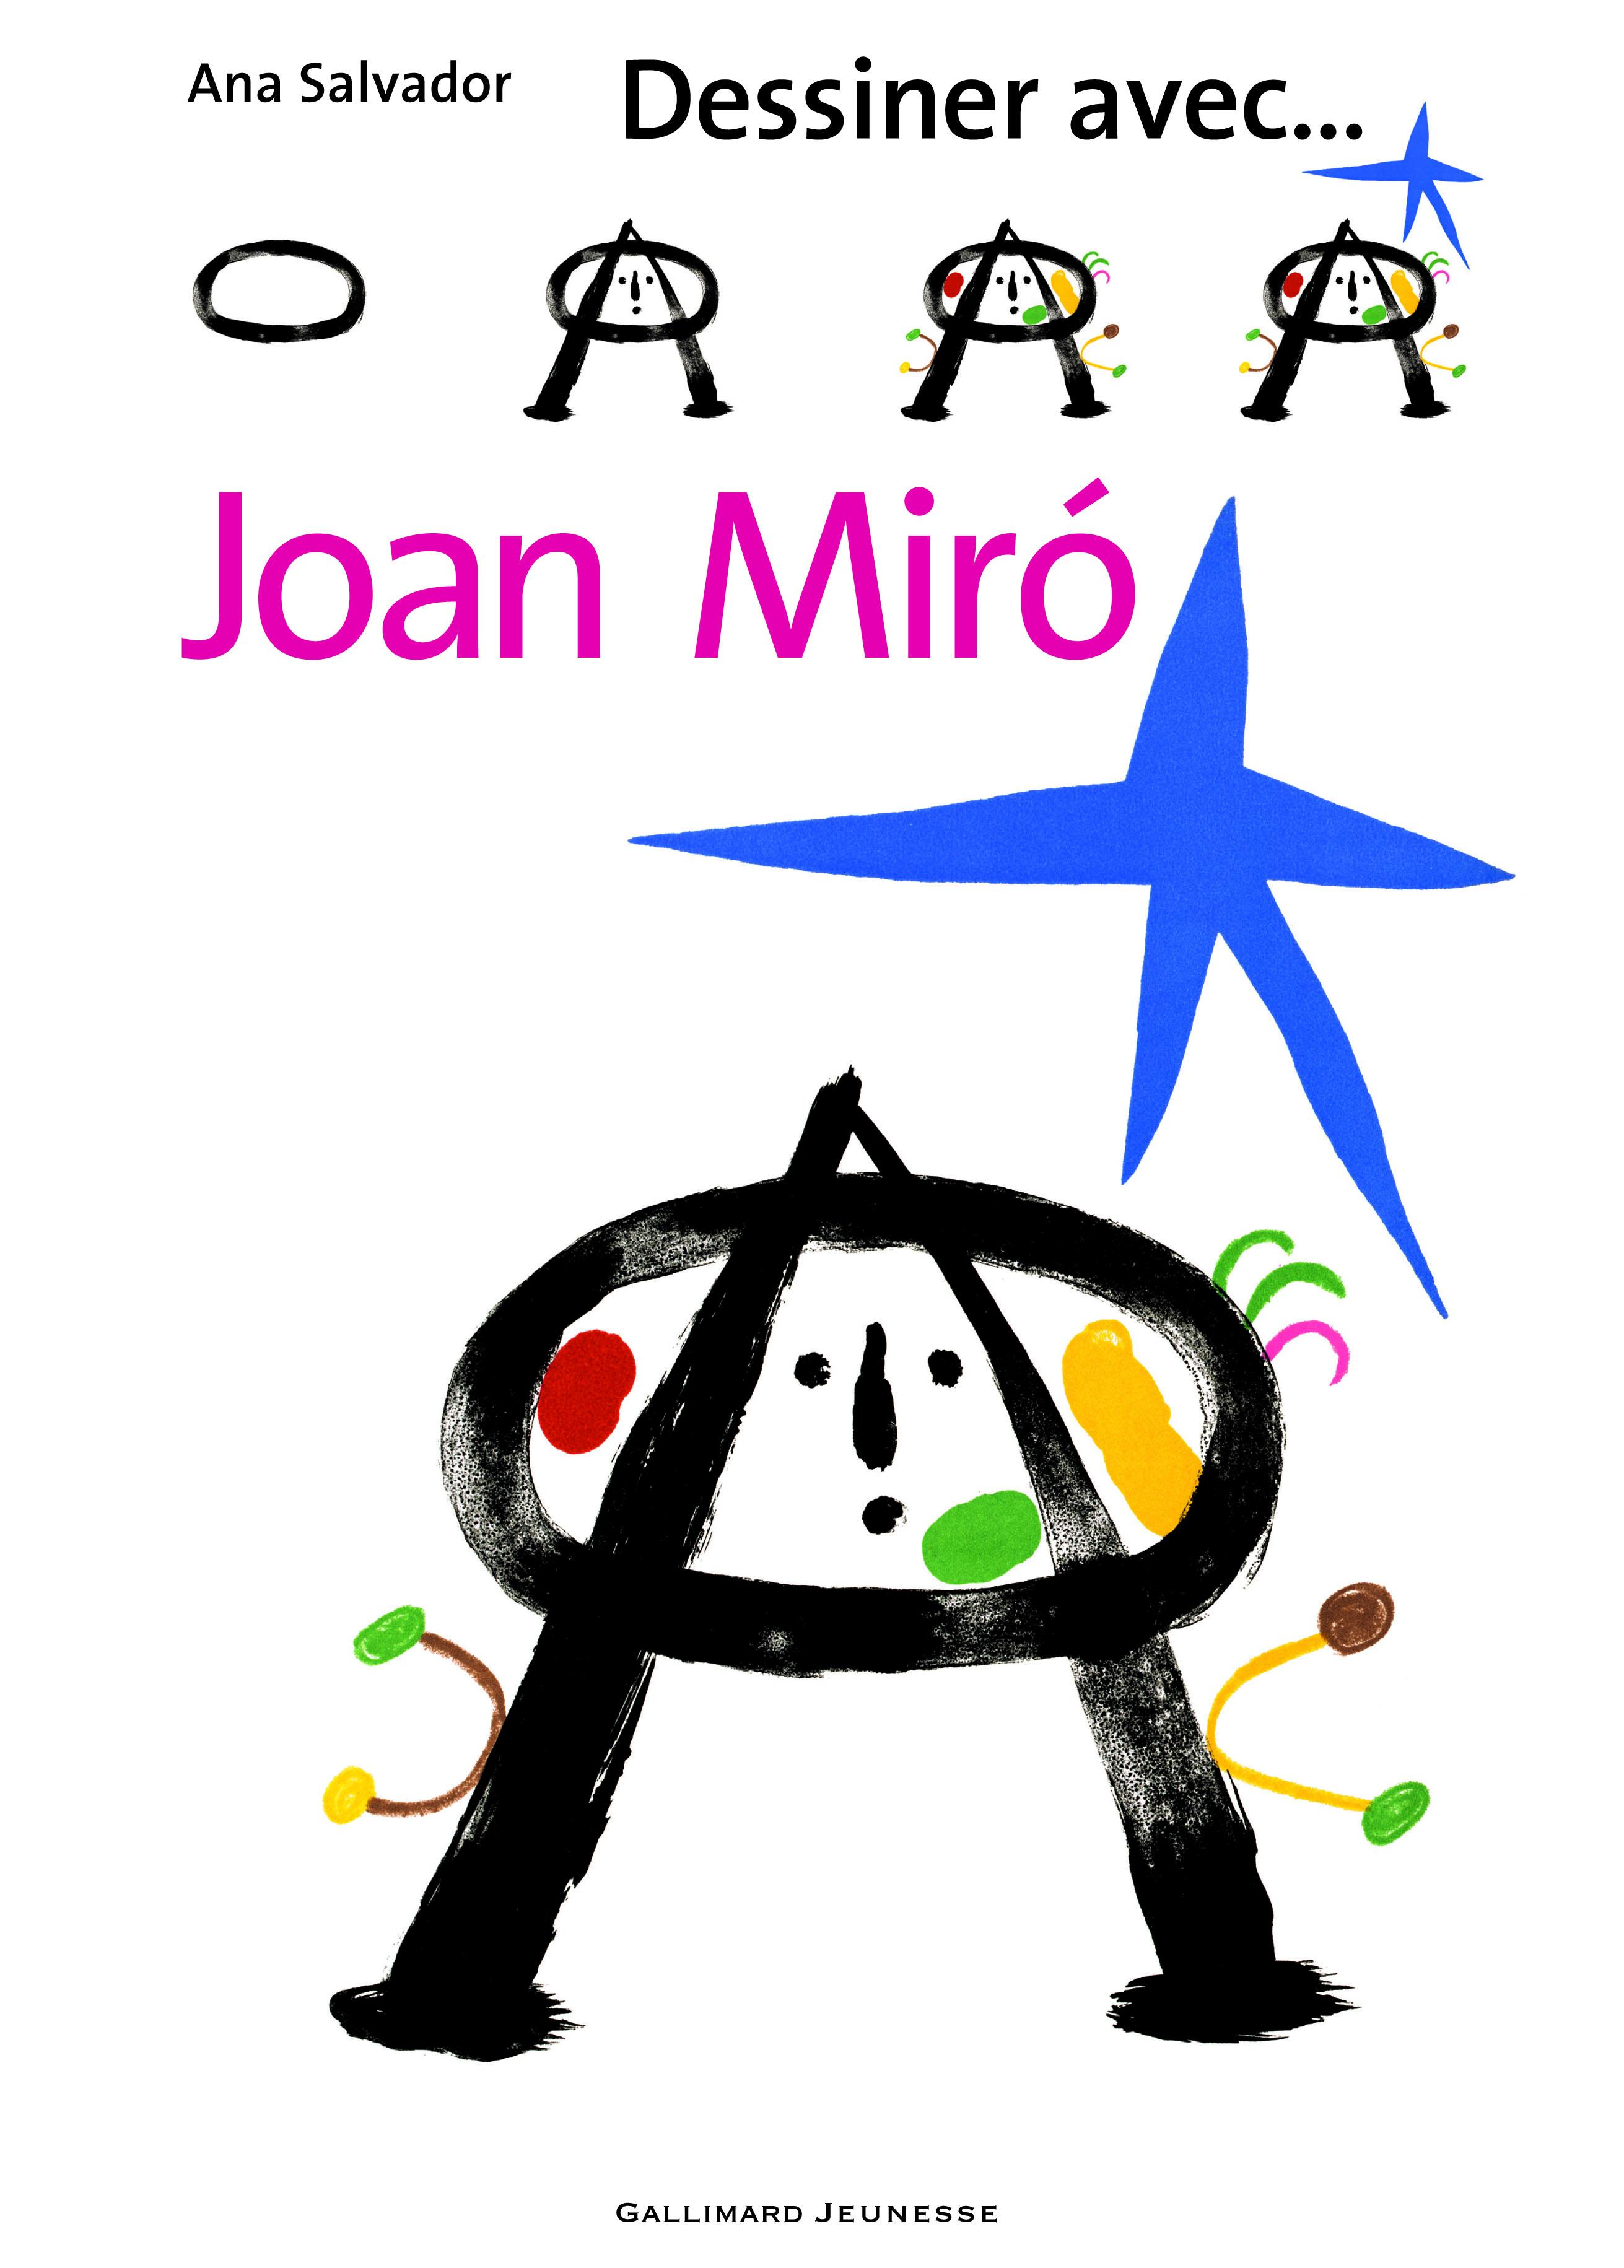 9d192665497 Dessiner avec... Joan Miró - Dessiner avec… - GALLIMARD JEUNESSE ...